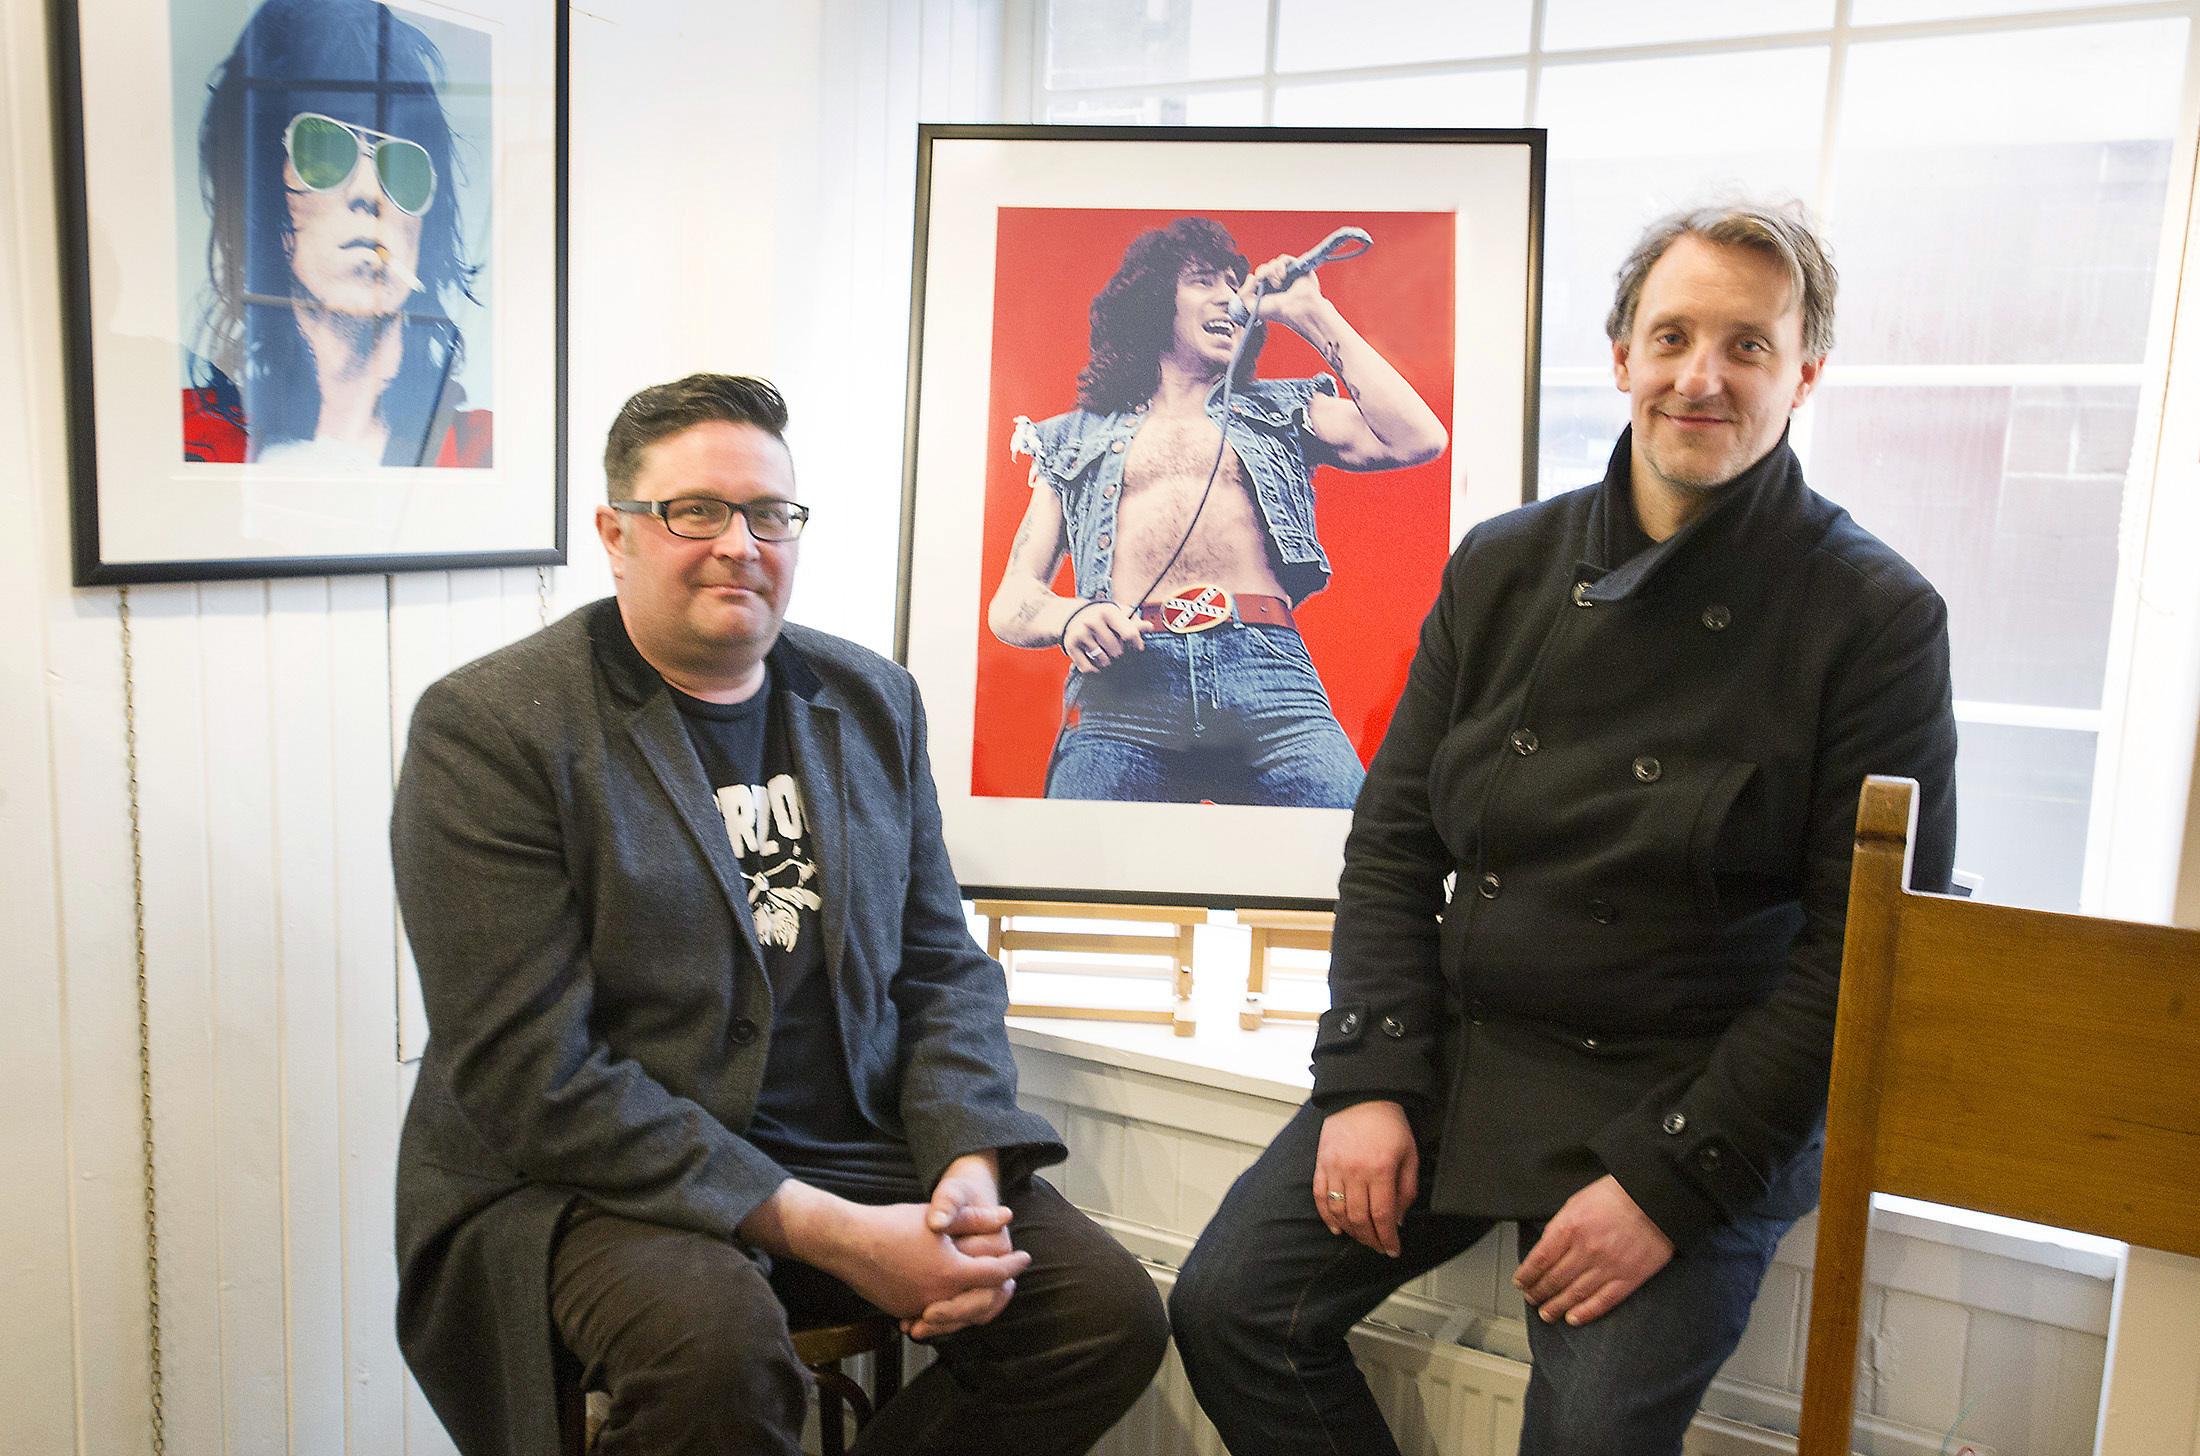 DD8 Music's Graham Galloway with Robert McSpadyen and his Bon Scott image.